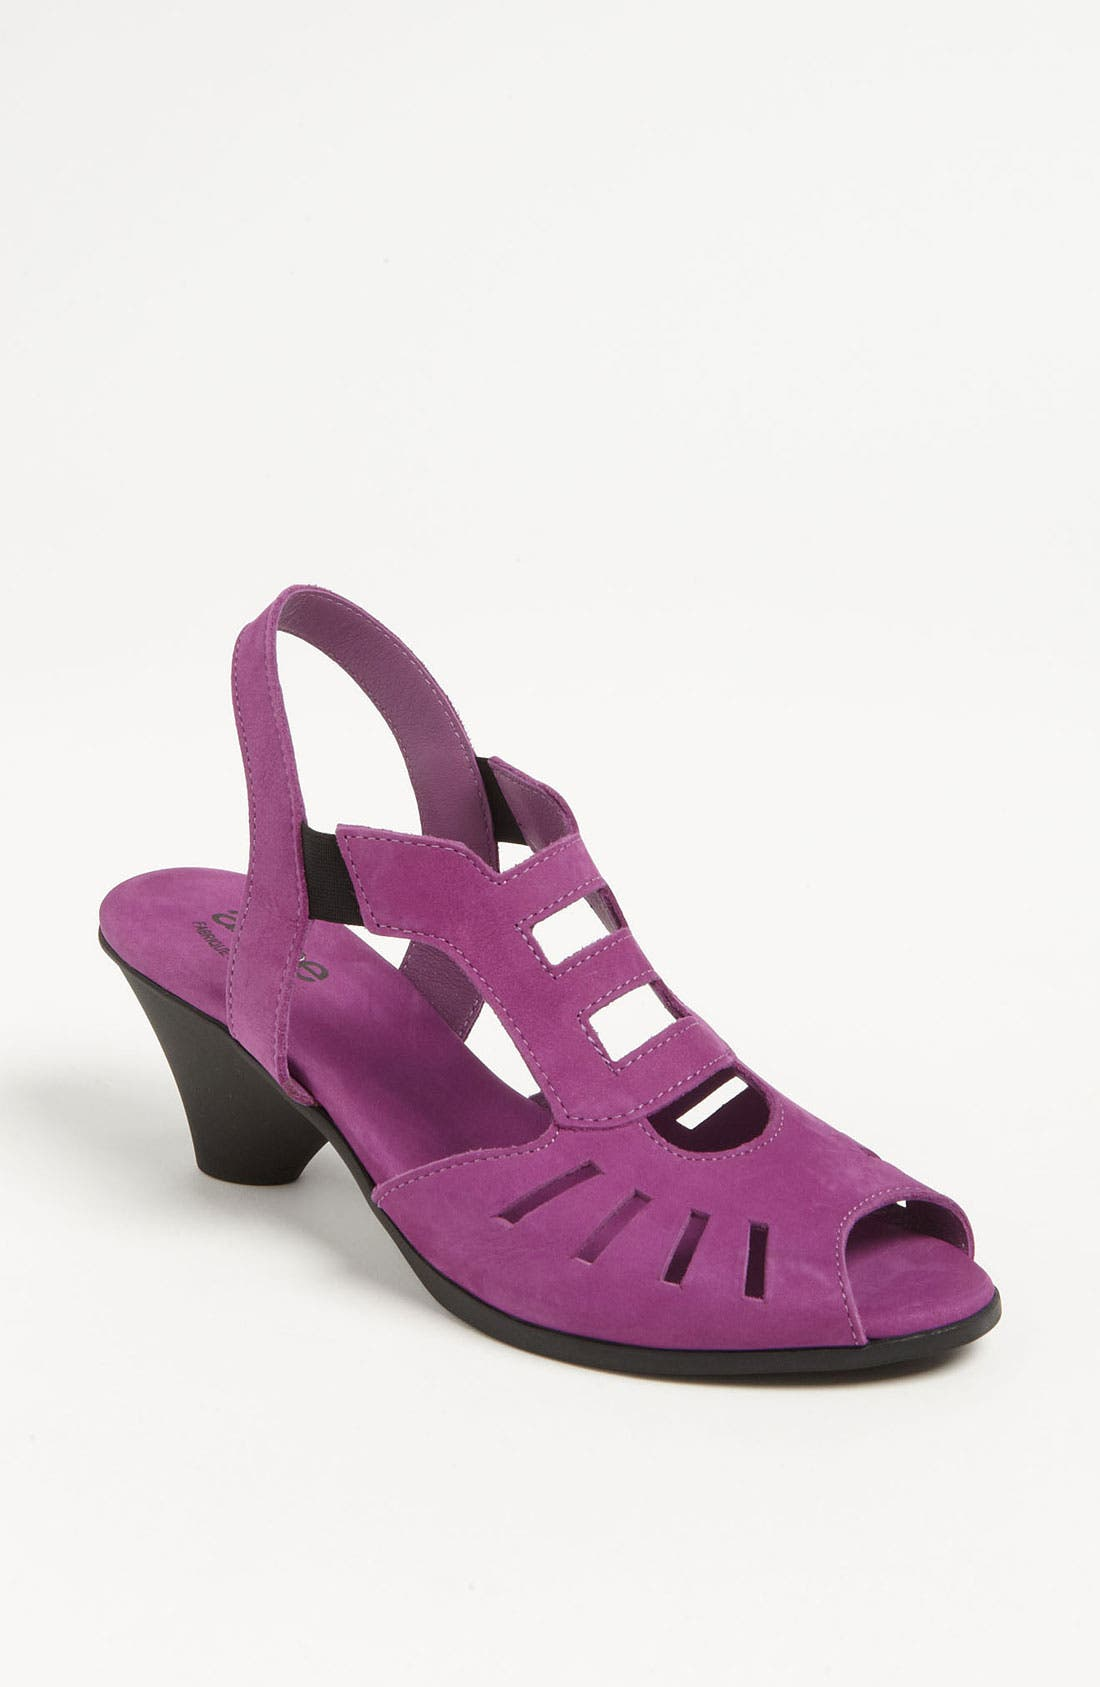 Alternate Image 1 Selected - Arche 'Exoko' Sandal